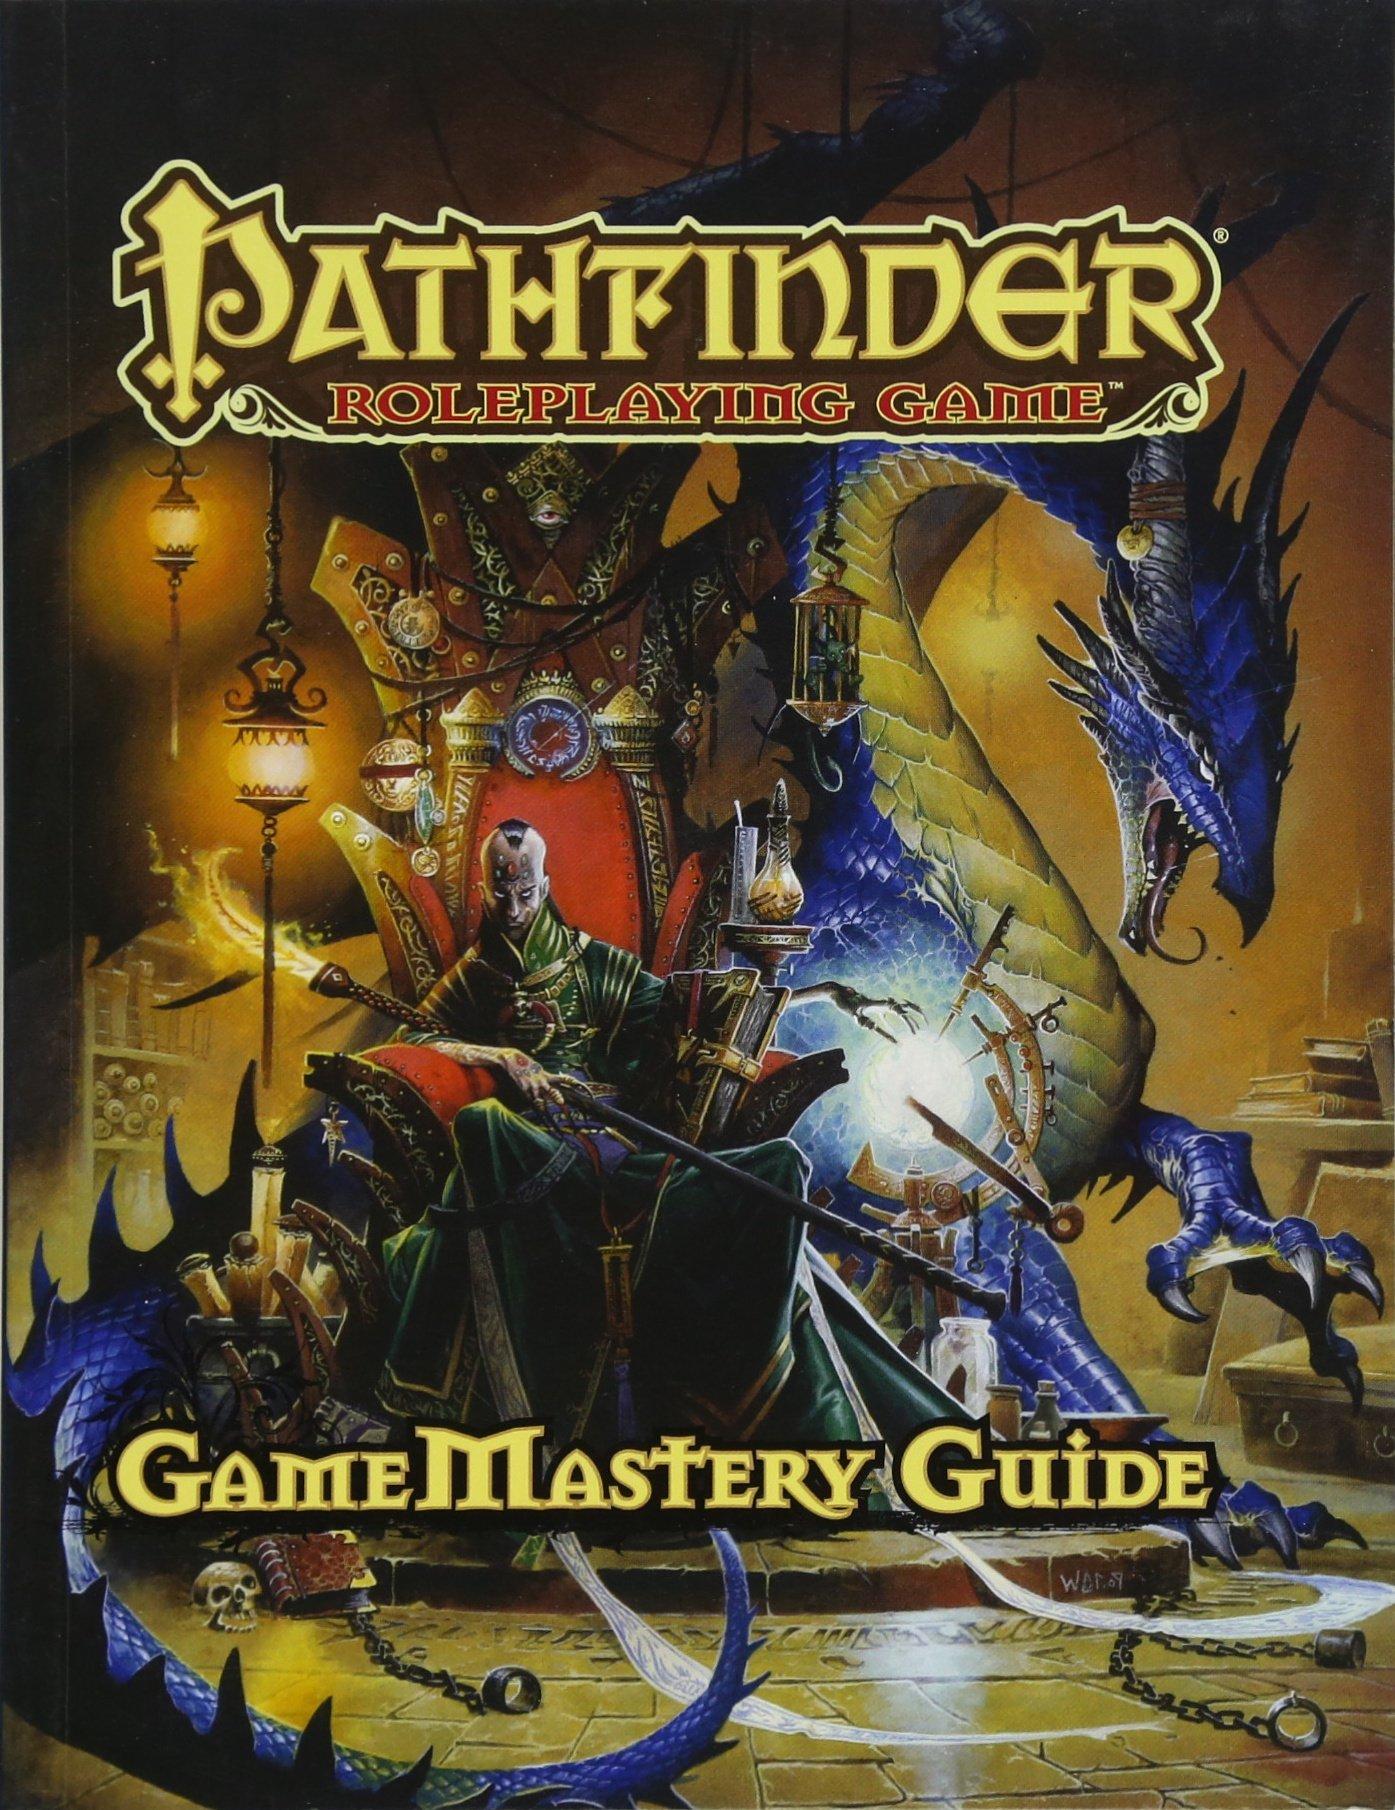 Pathfinder RPG GameMastery Guide (Pocket Edition)